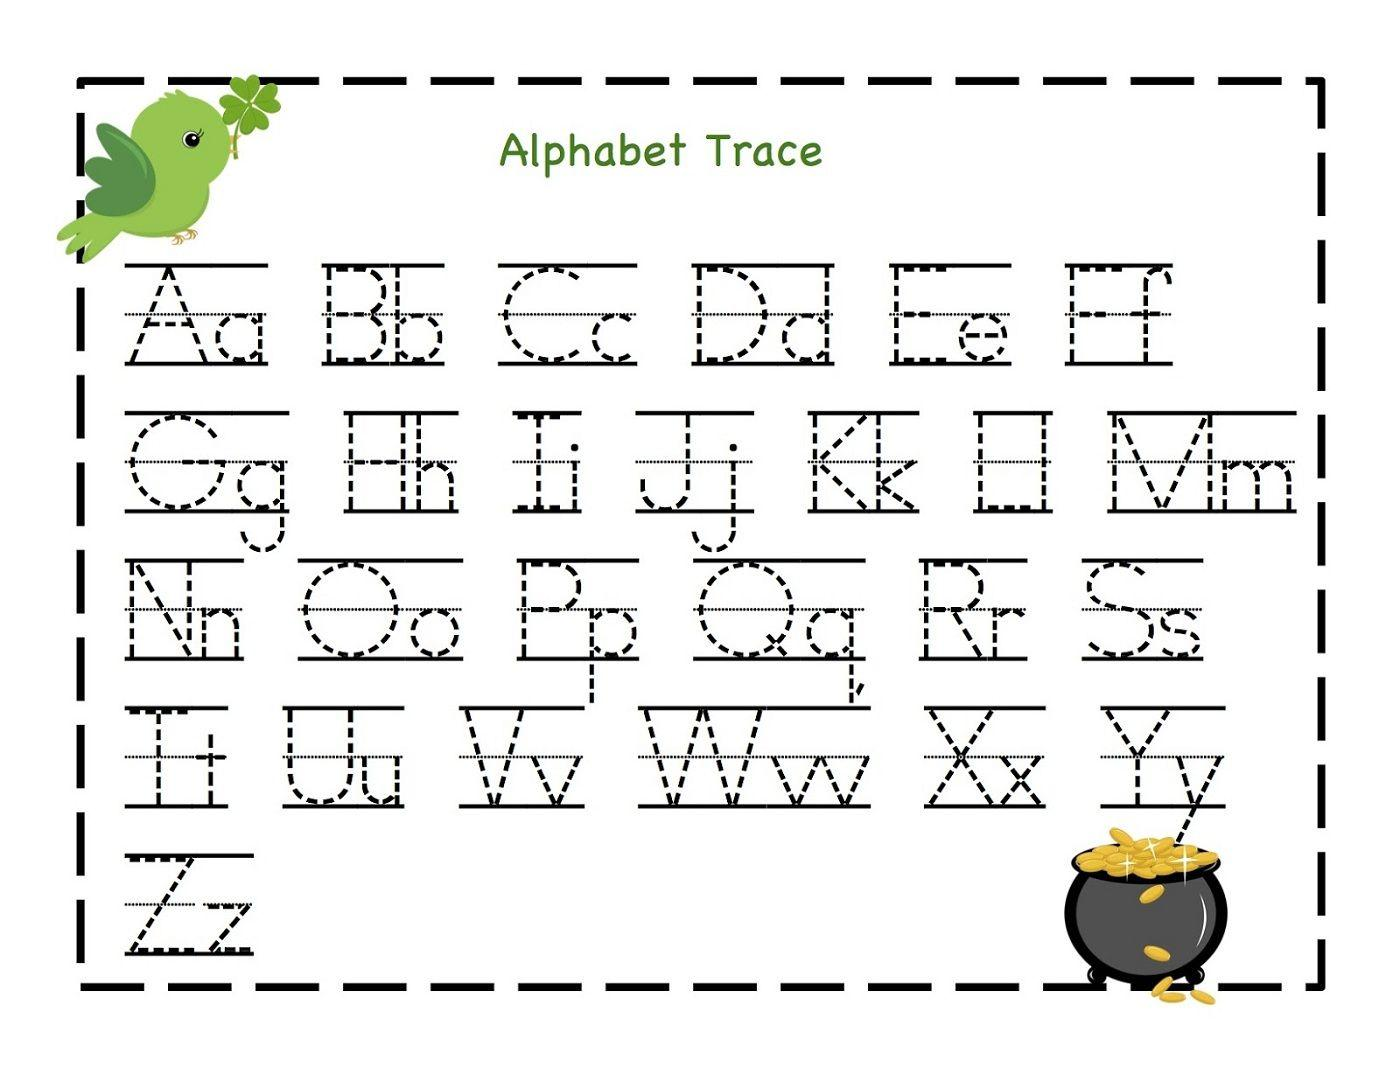 hight resolution of Printable Alphabet Worksheets For 3 Year Olds – Letter Worksheets